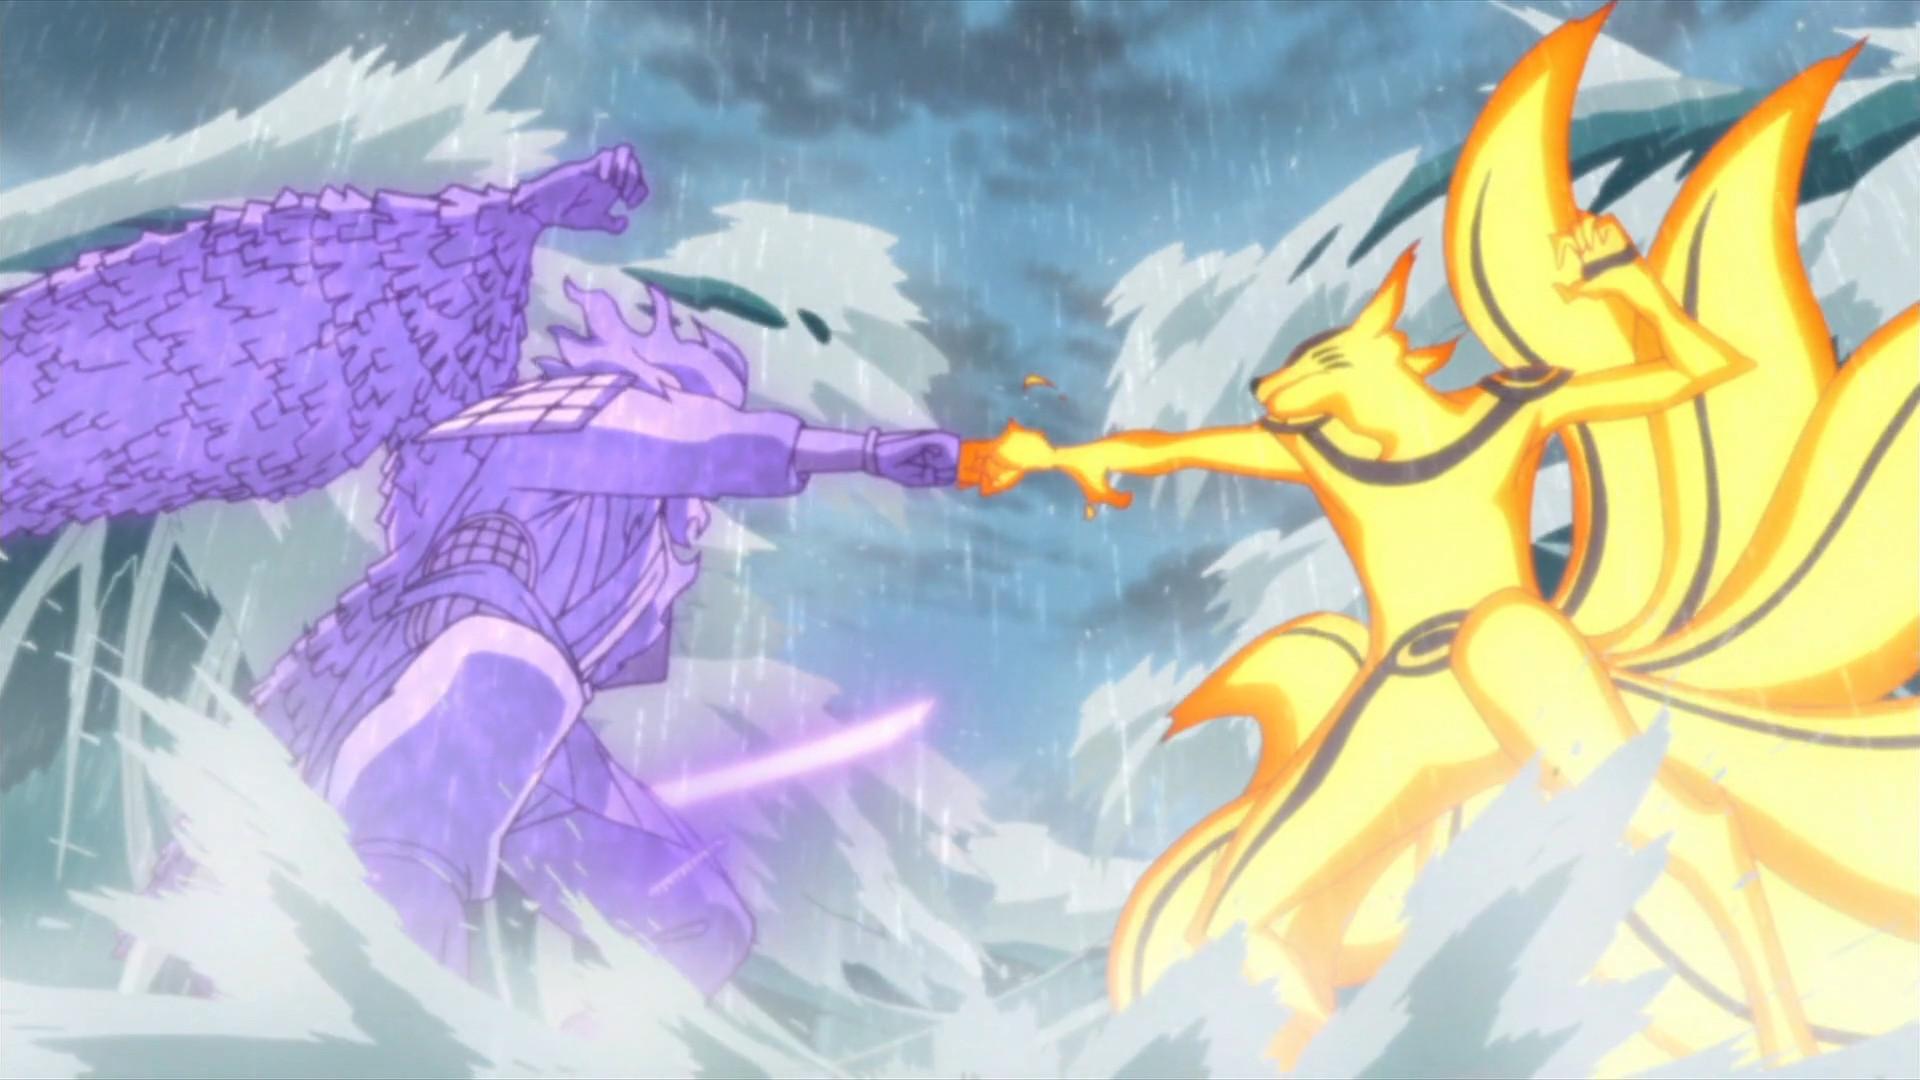 28 285293 i saved this one naruto sasuke combat final